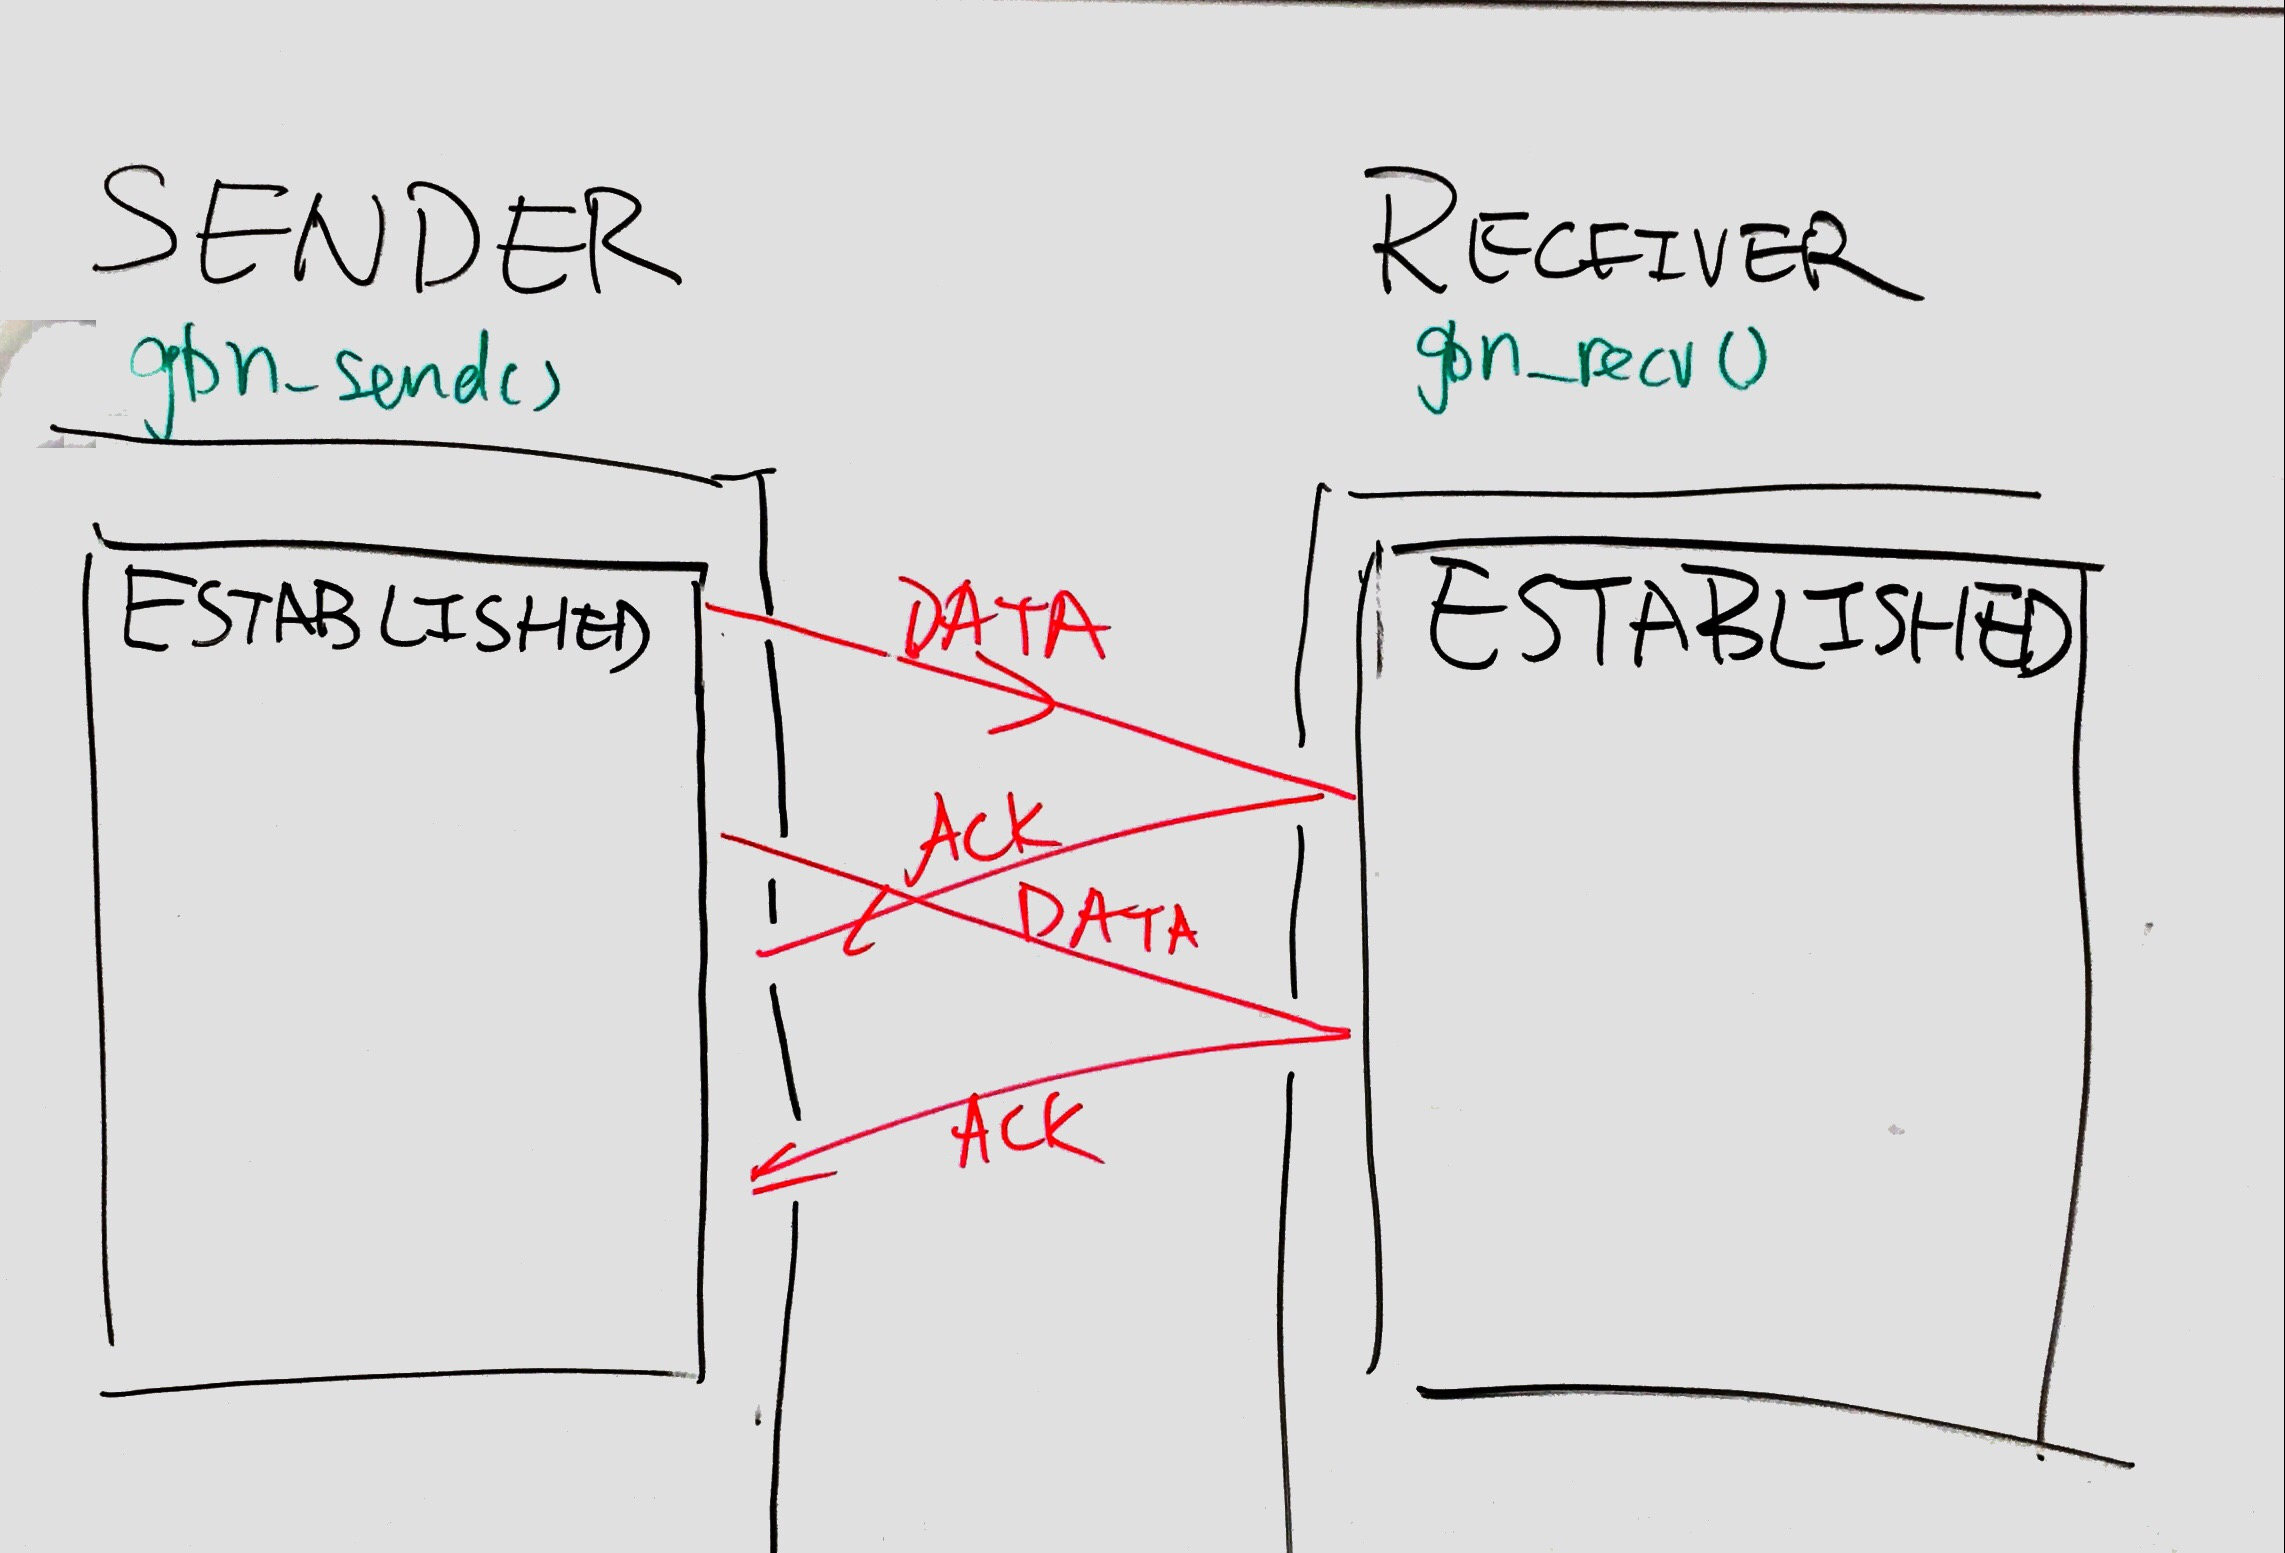 tcp three way handshake diagram hard drive github mw866 go back n like protocol